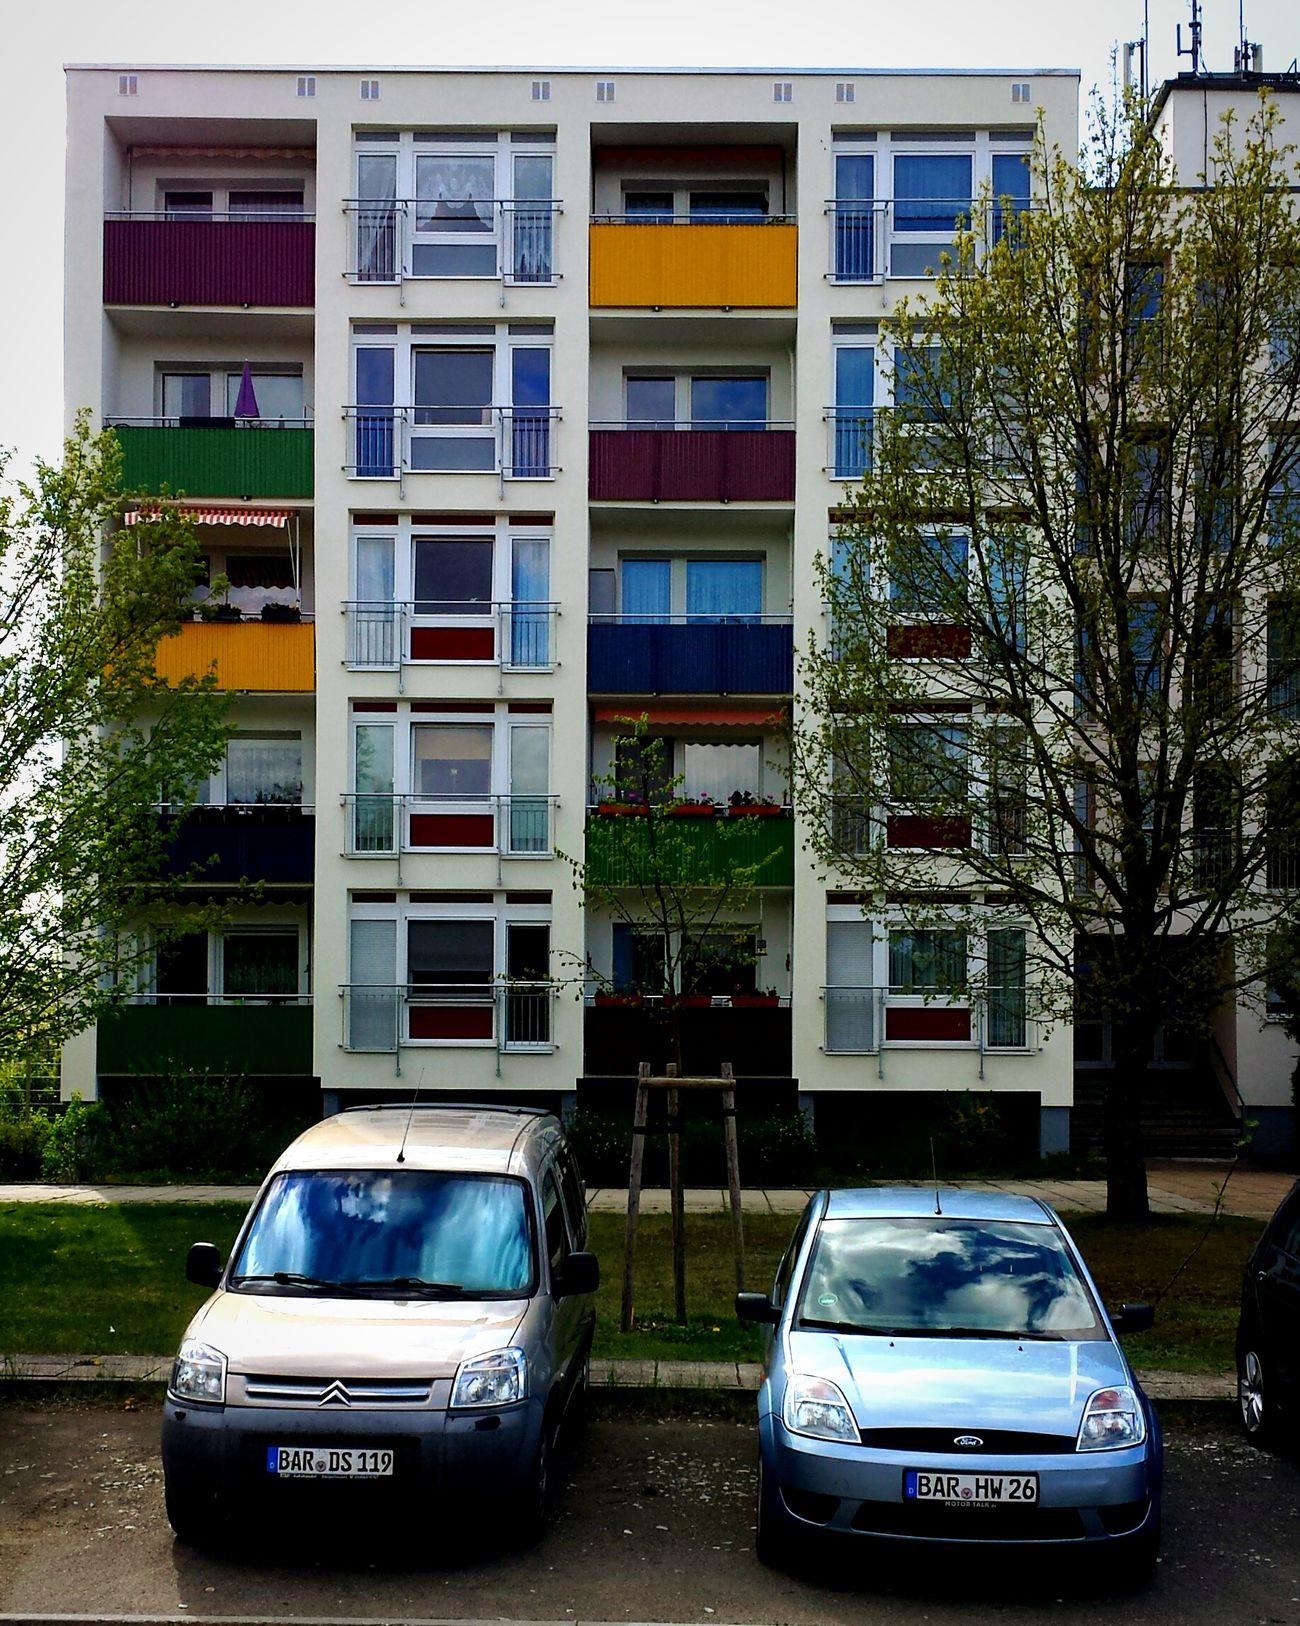 Tenements Eberswalde Eastgermany Colors